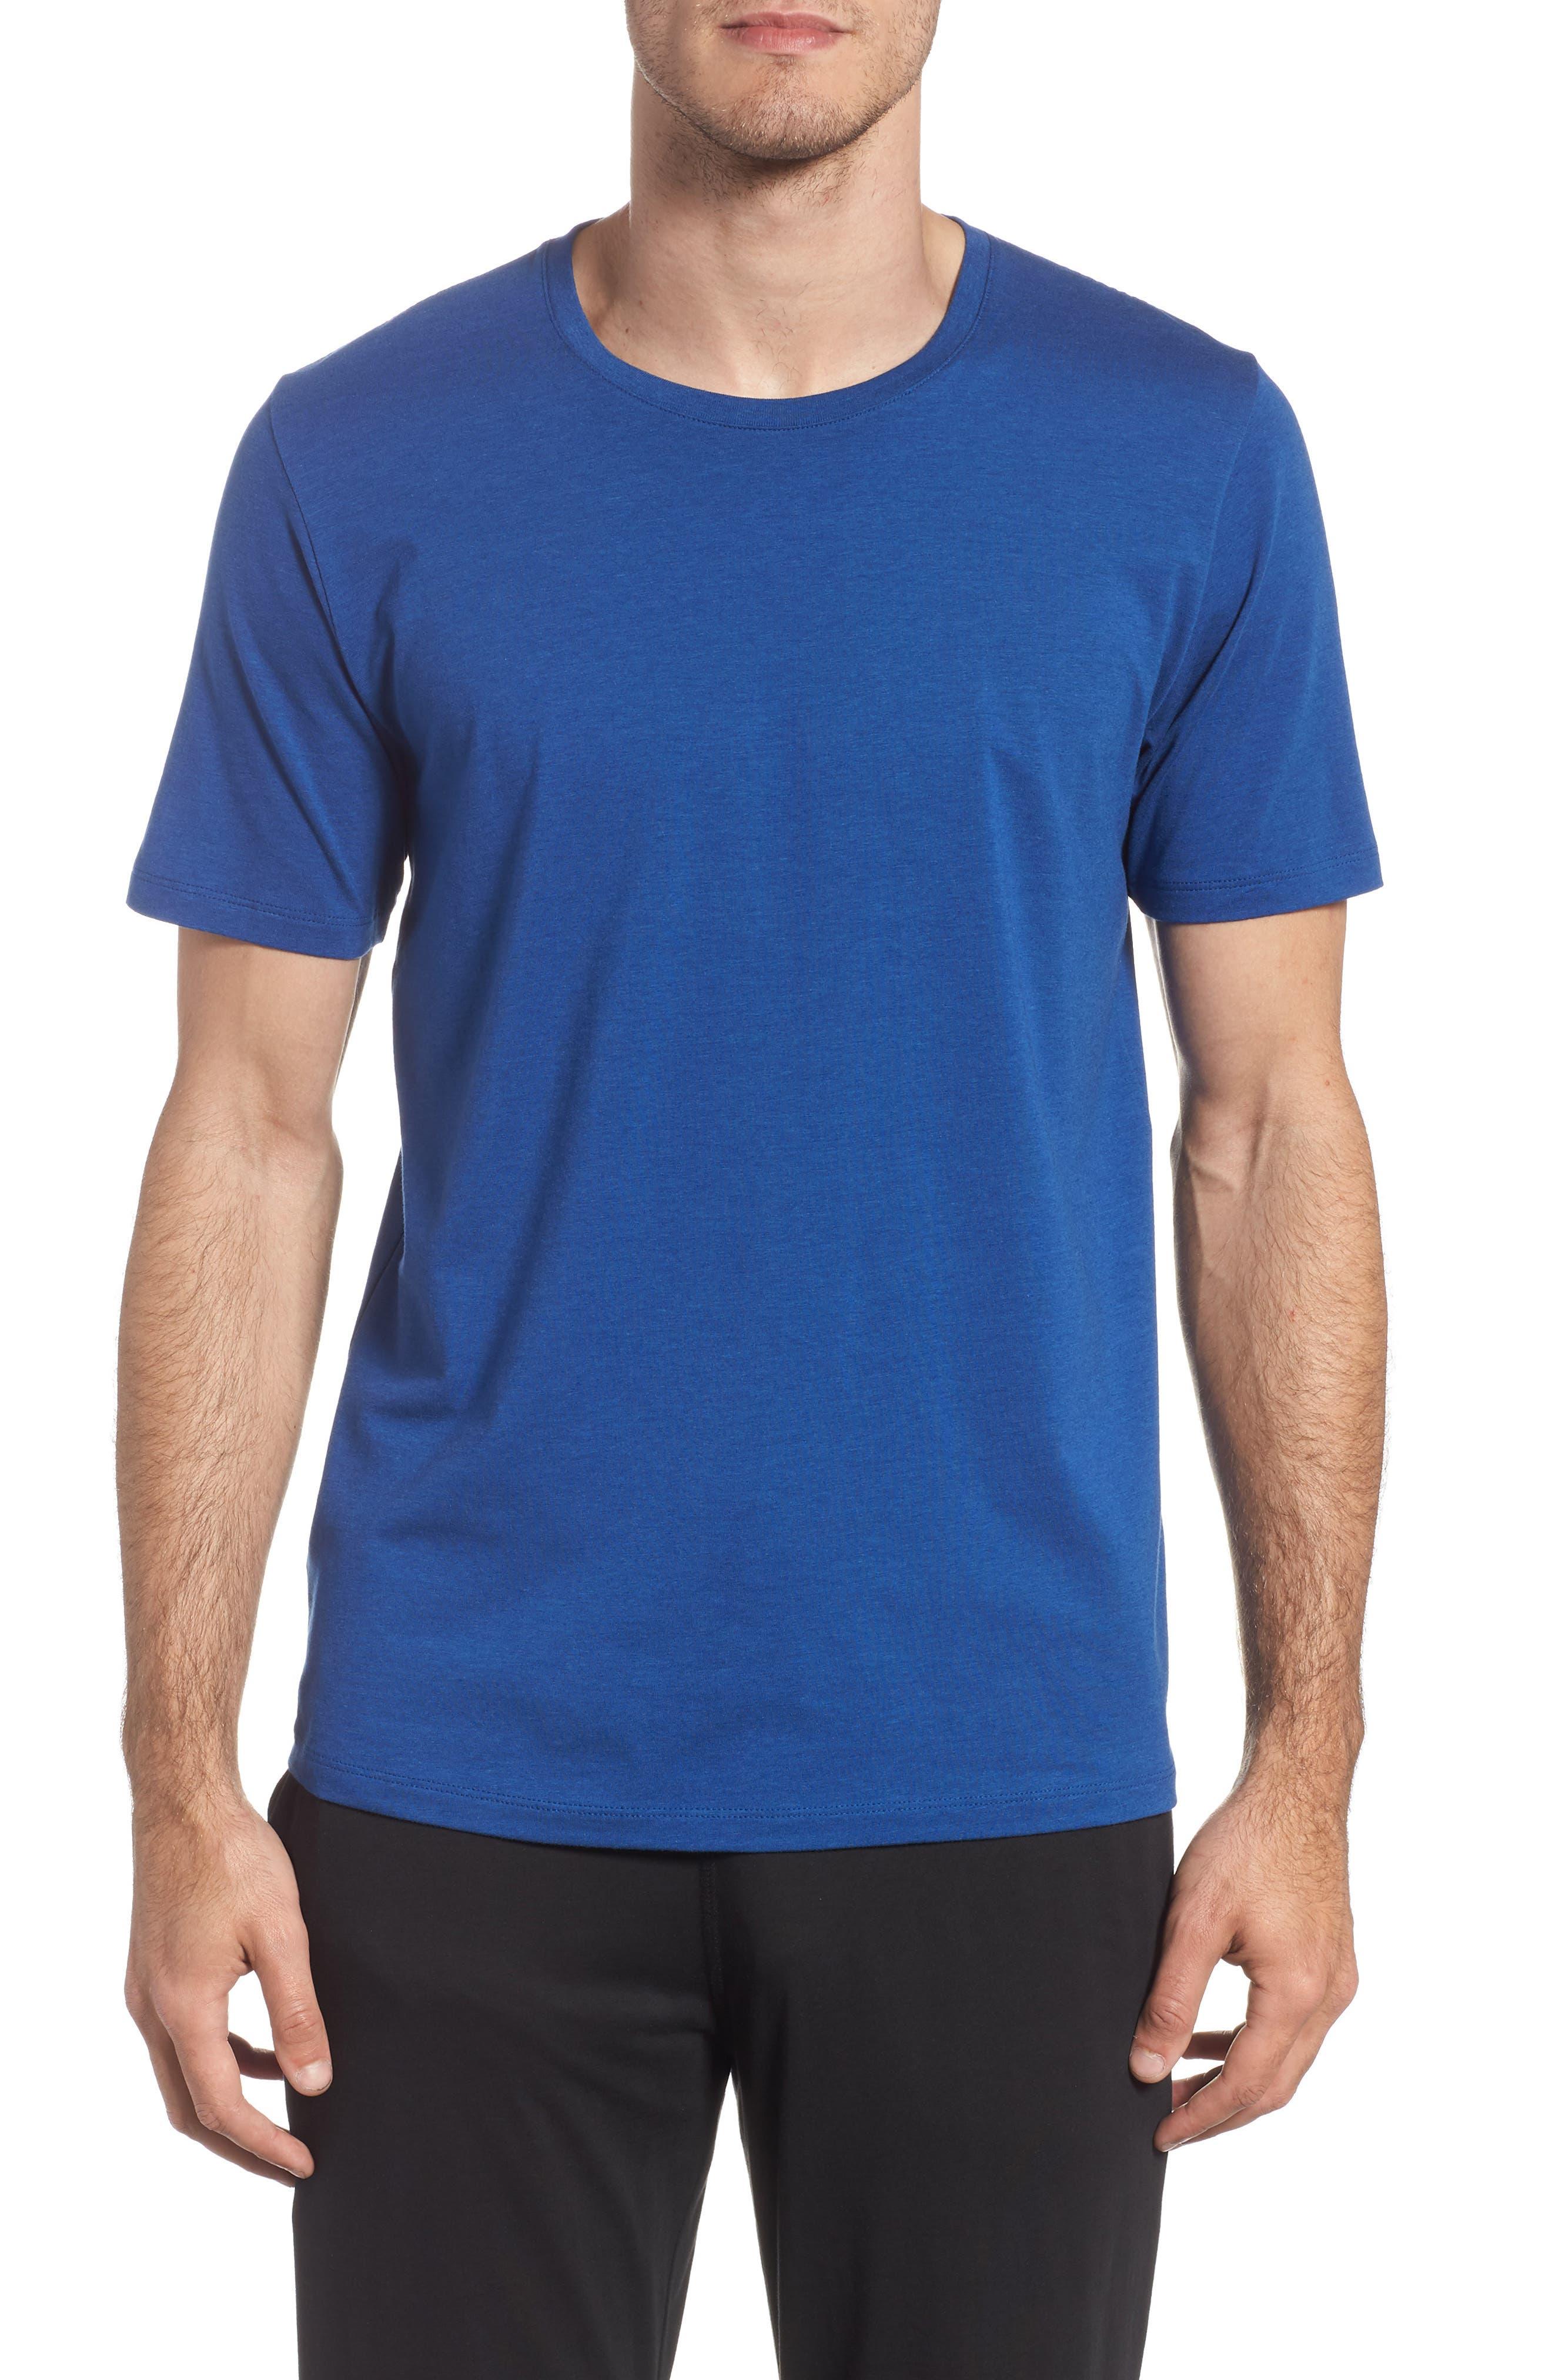 Tommy John Cotton Blend Crewneck T-Shirt